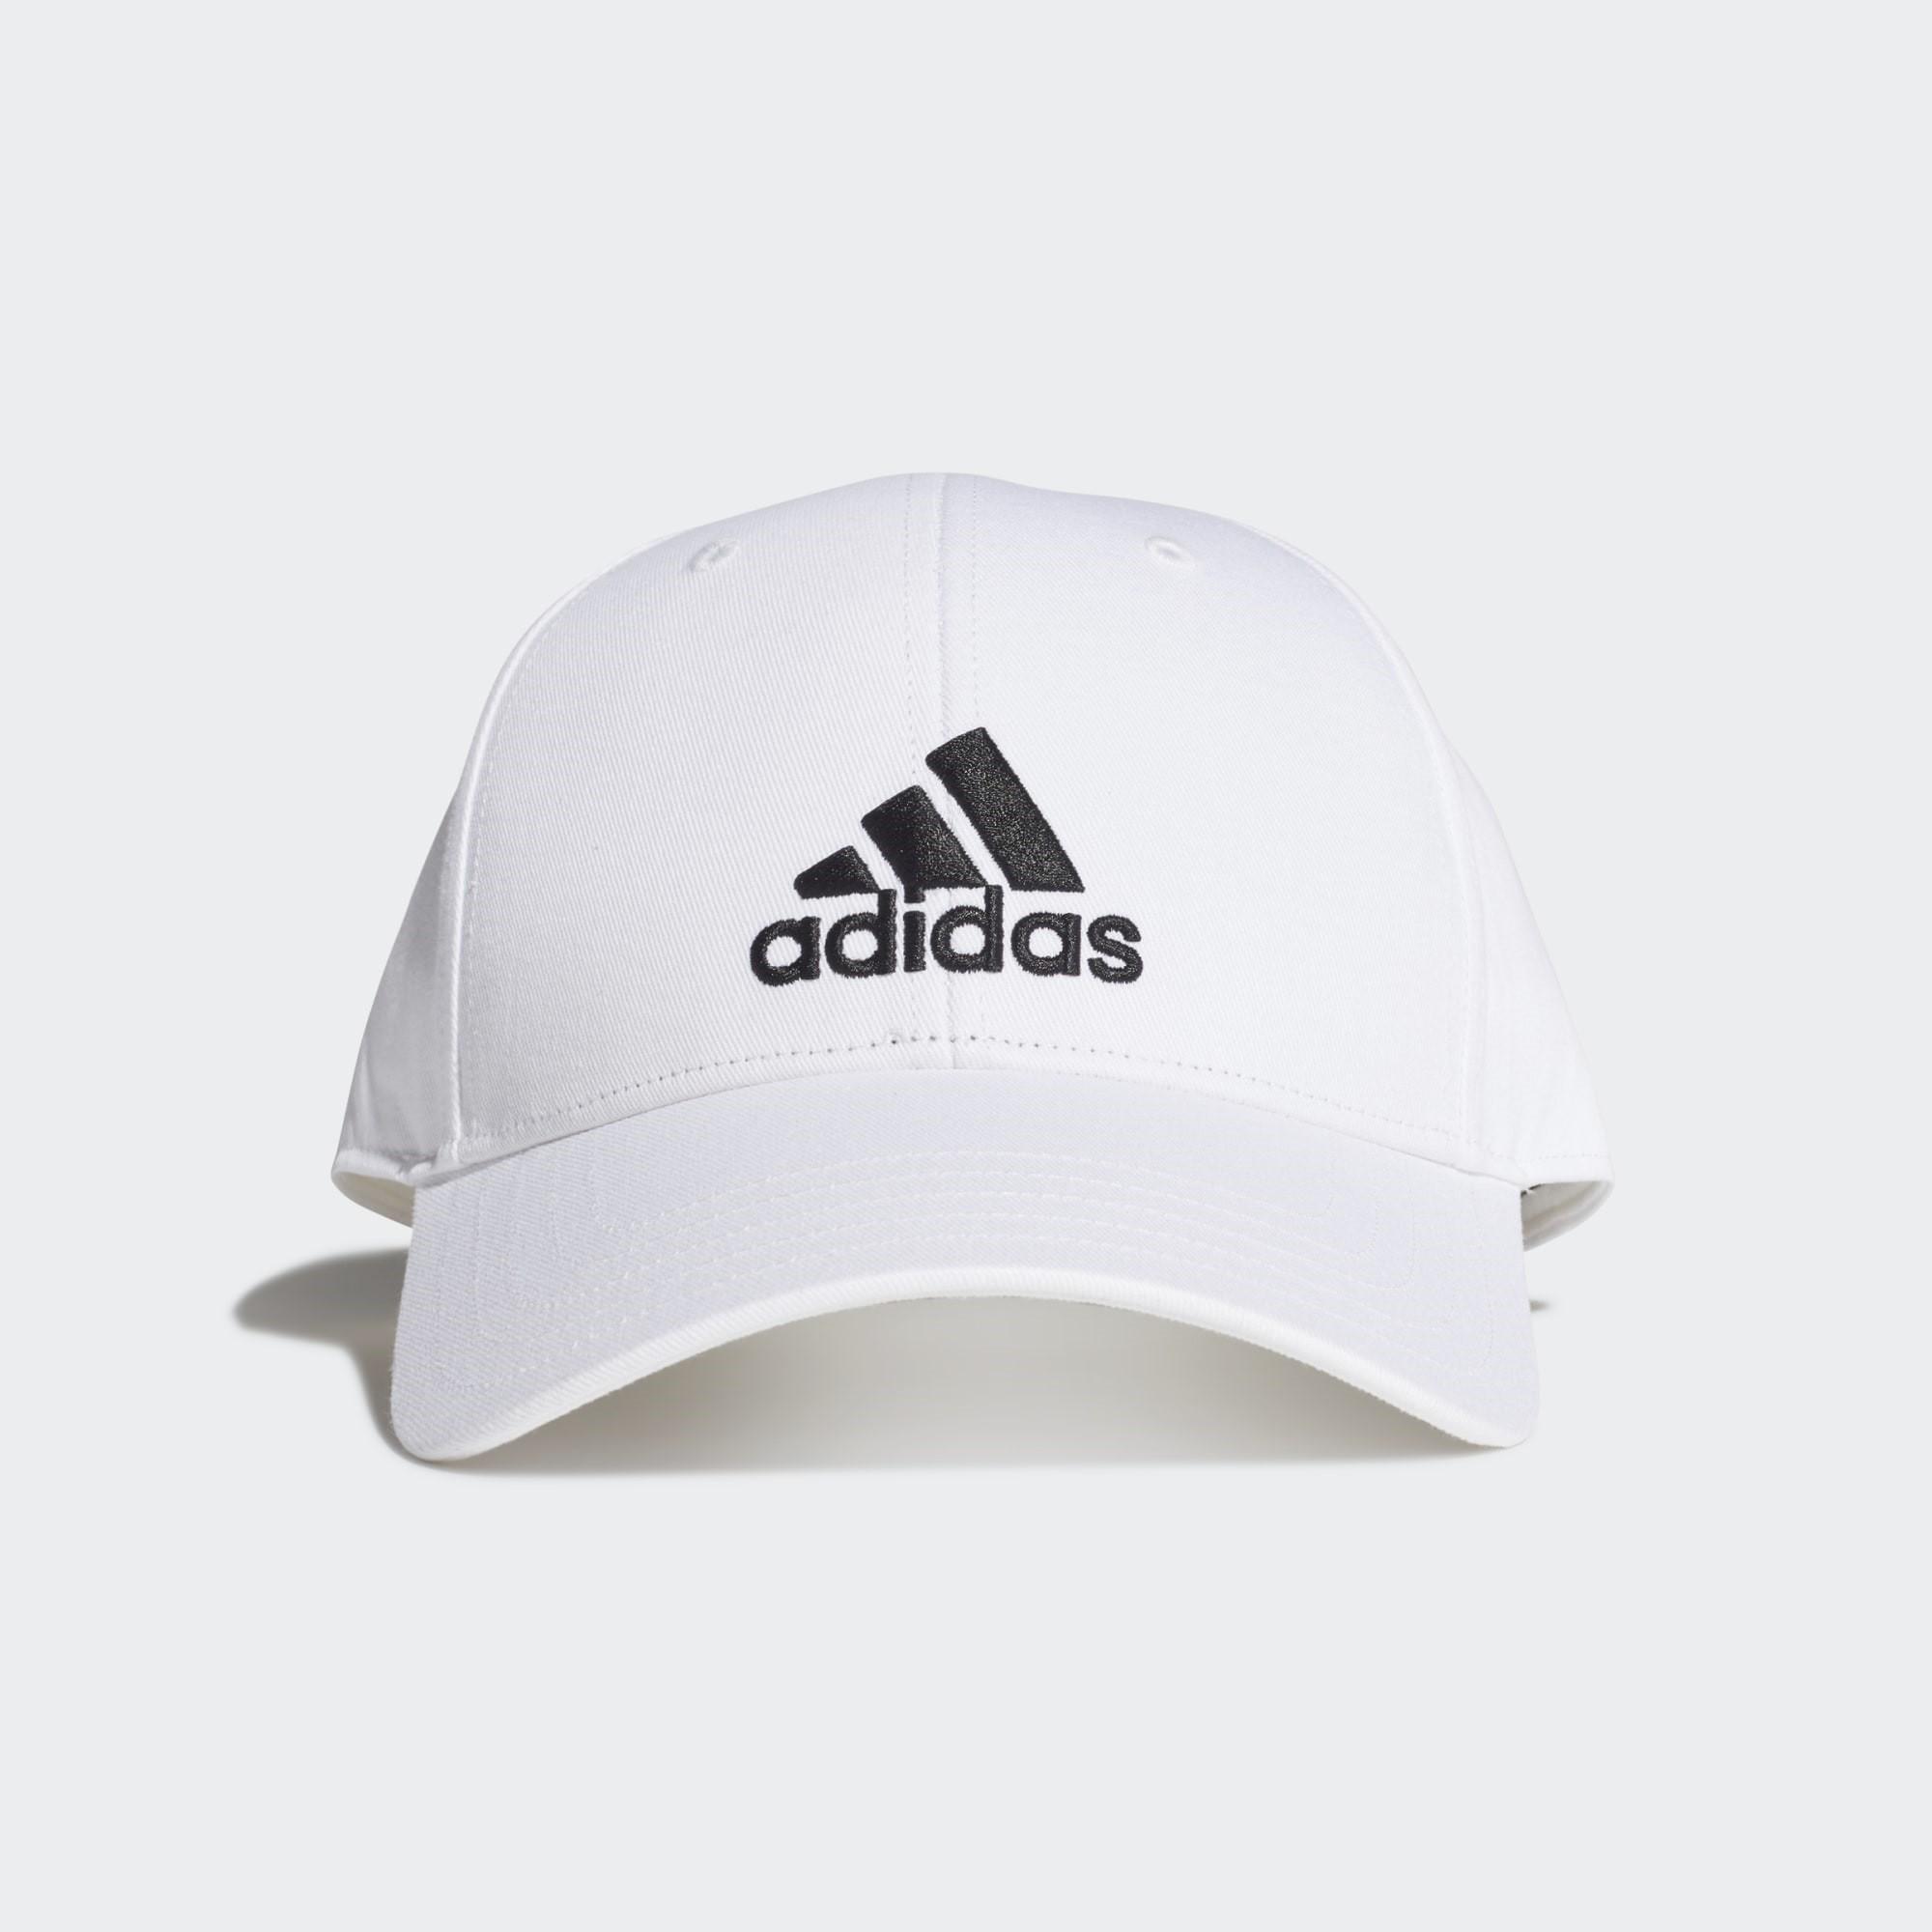 Adidas Baseball Kappe, weiß